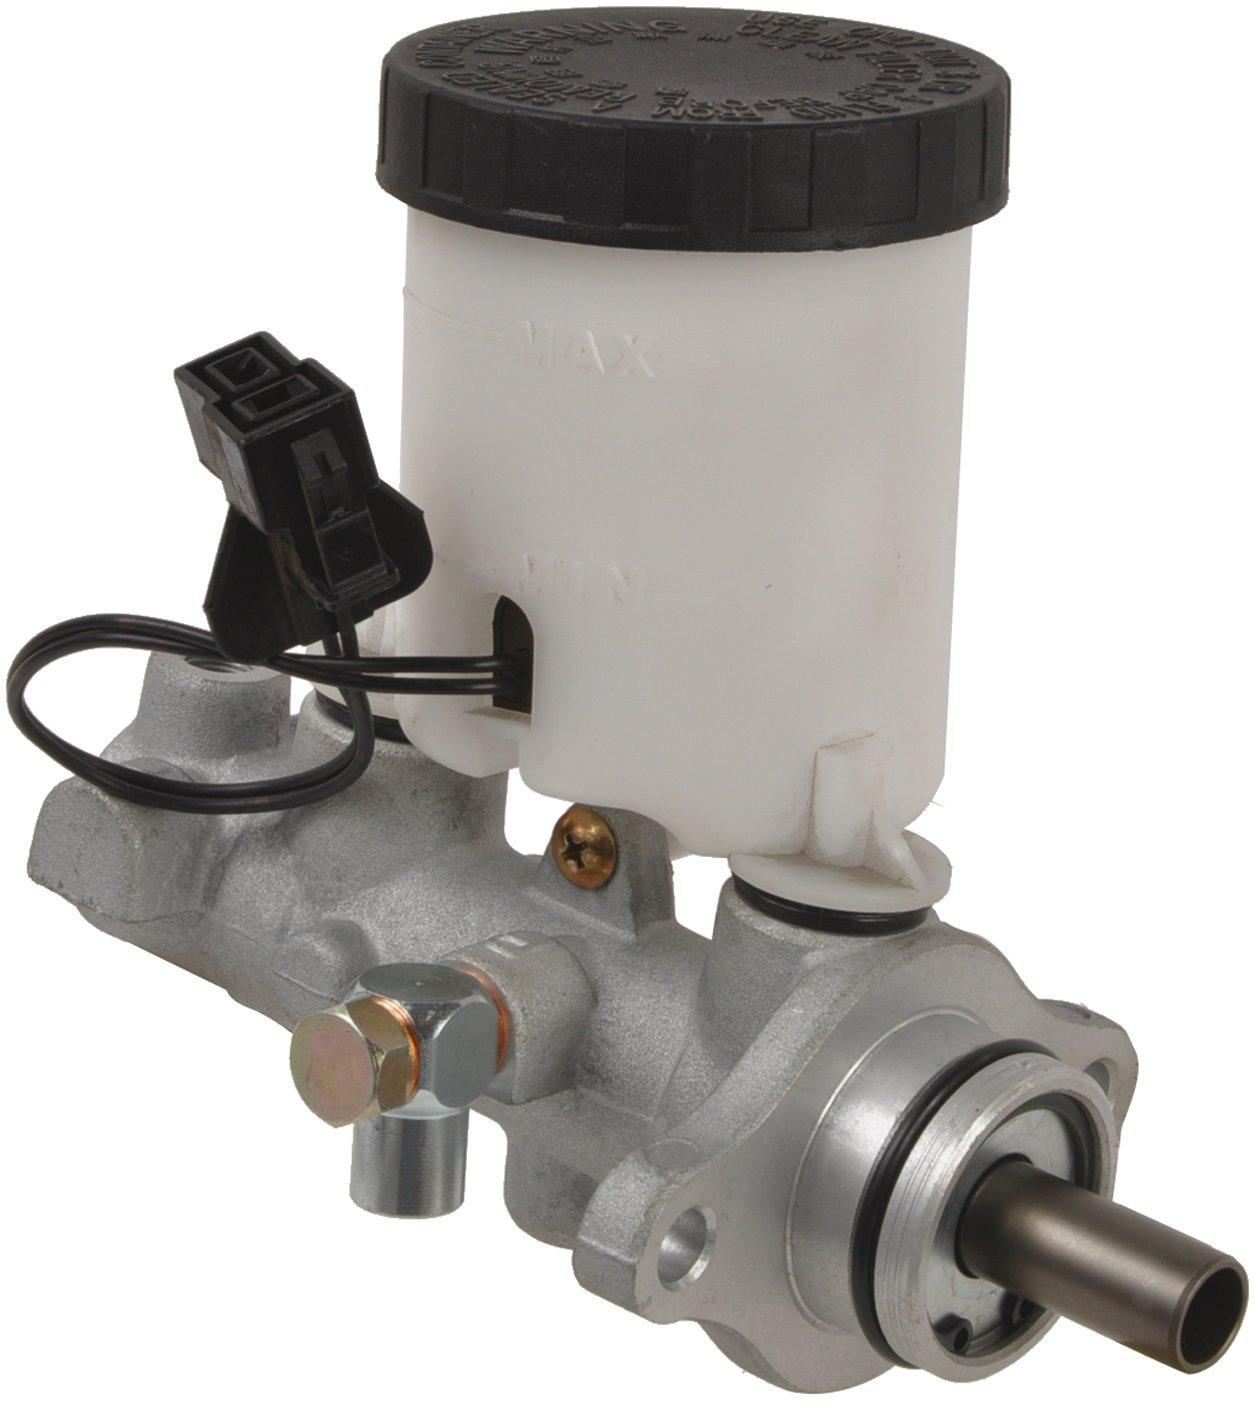 1991 Miata Fuel System